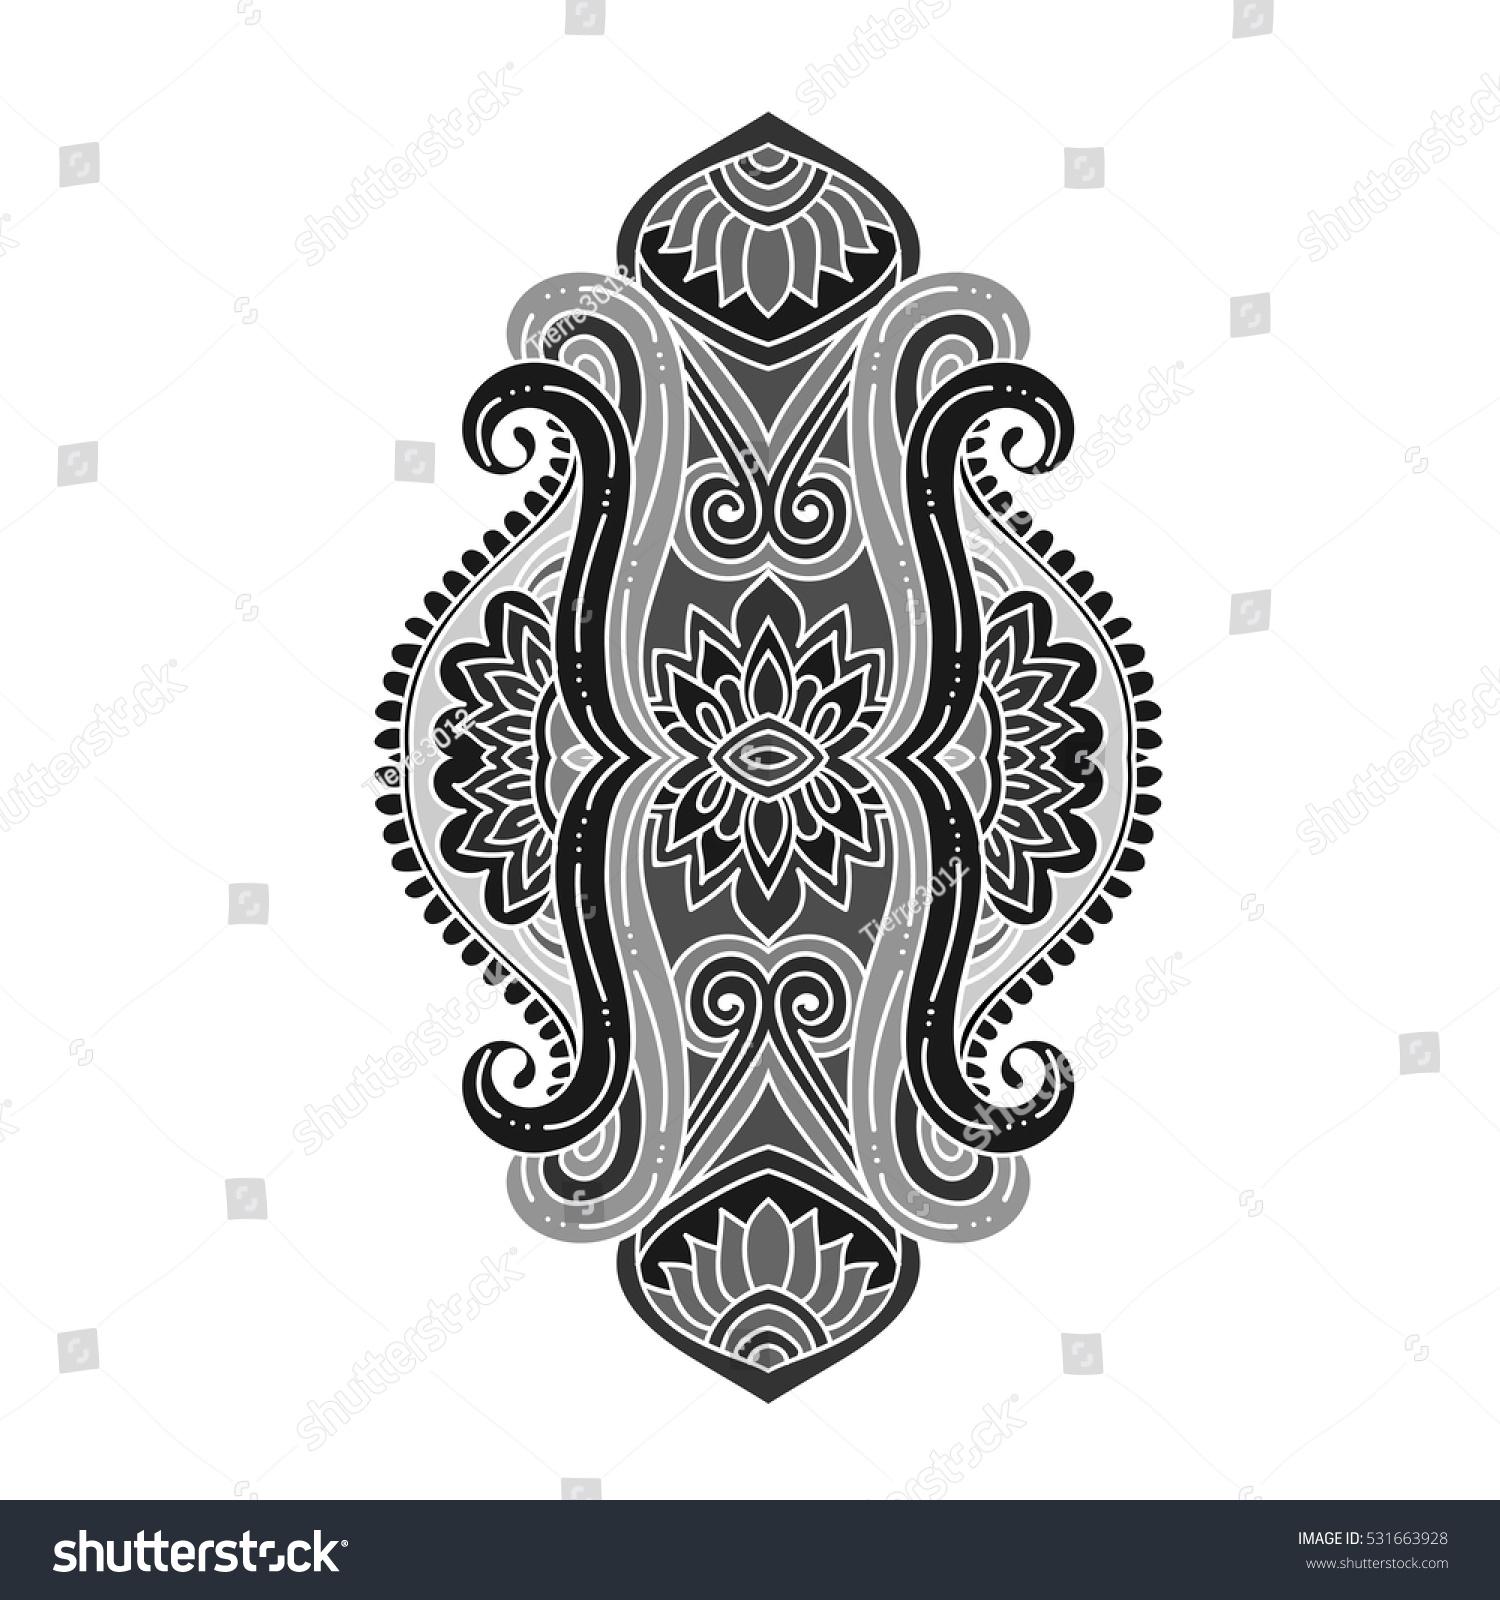 Stylized monochrome grey vector ornamental lotus stock vector stylized monochrome grey vector ornamental lotus flower ethnic art patterned indian paisley hand izmirmasajfo